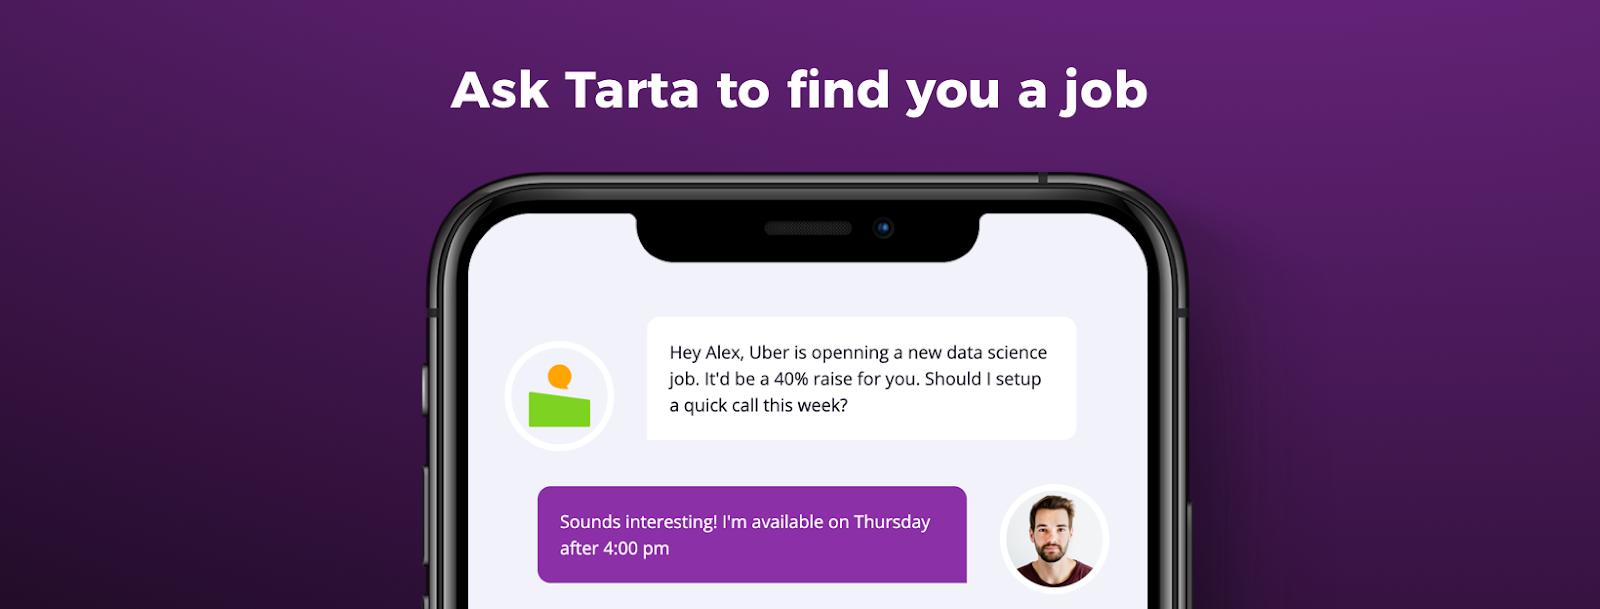 Tarta AI's promotional banner